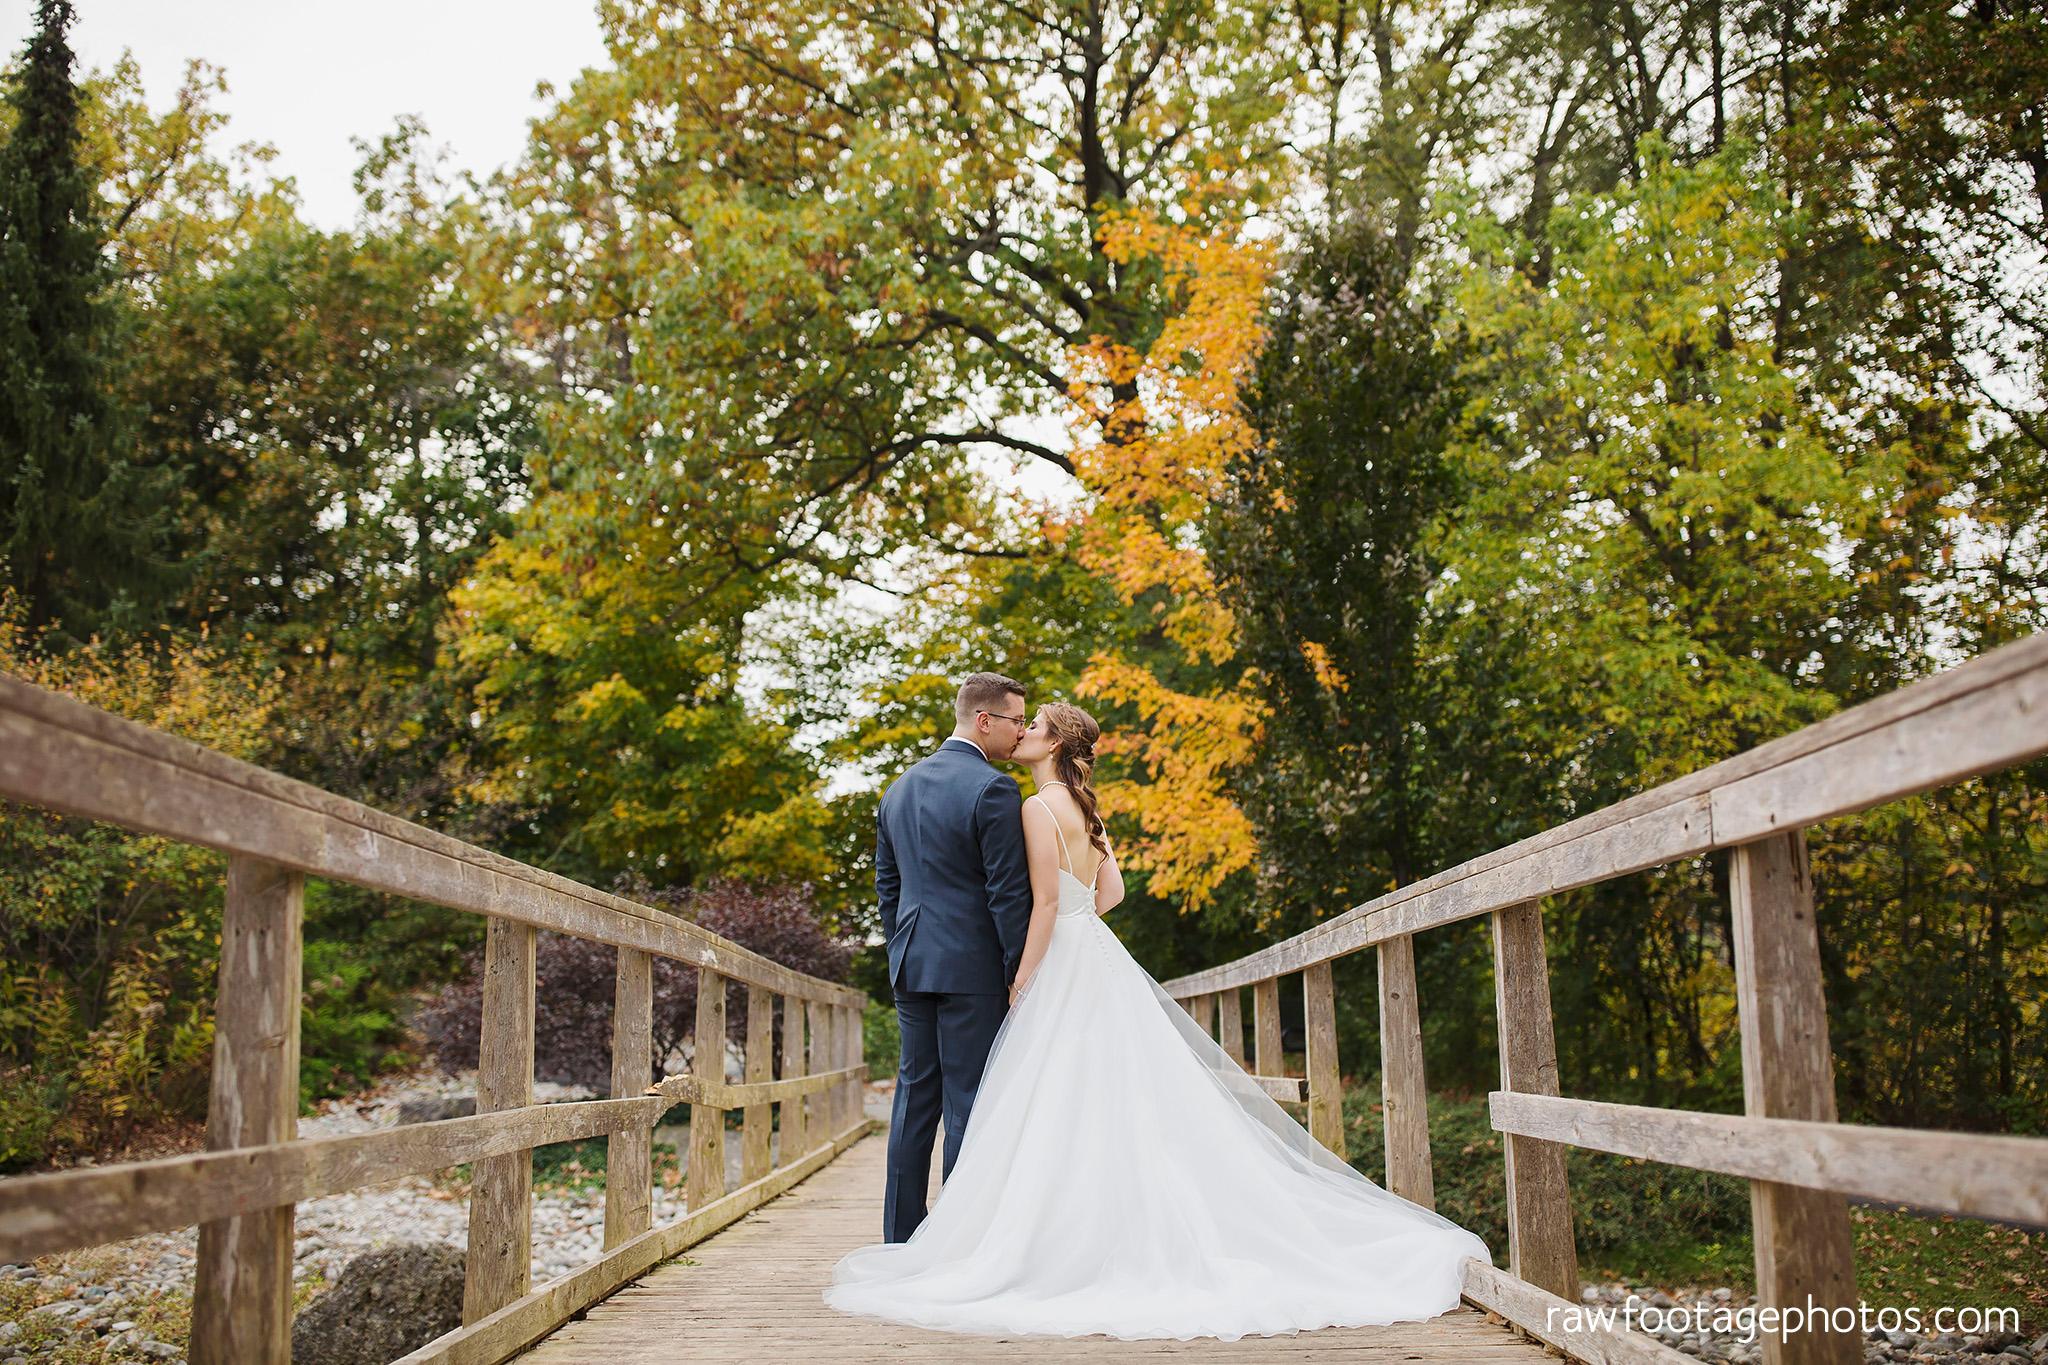 london_ontario_wedding_photographer-civic_gardens-springbank_park-succulent_bouquet-fall_wedding-bridge-raw_footage_photography060.jpg